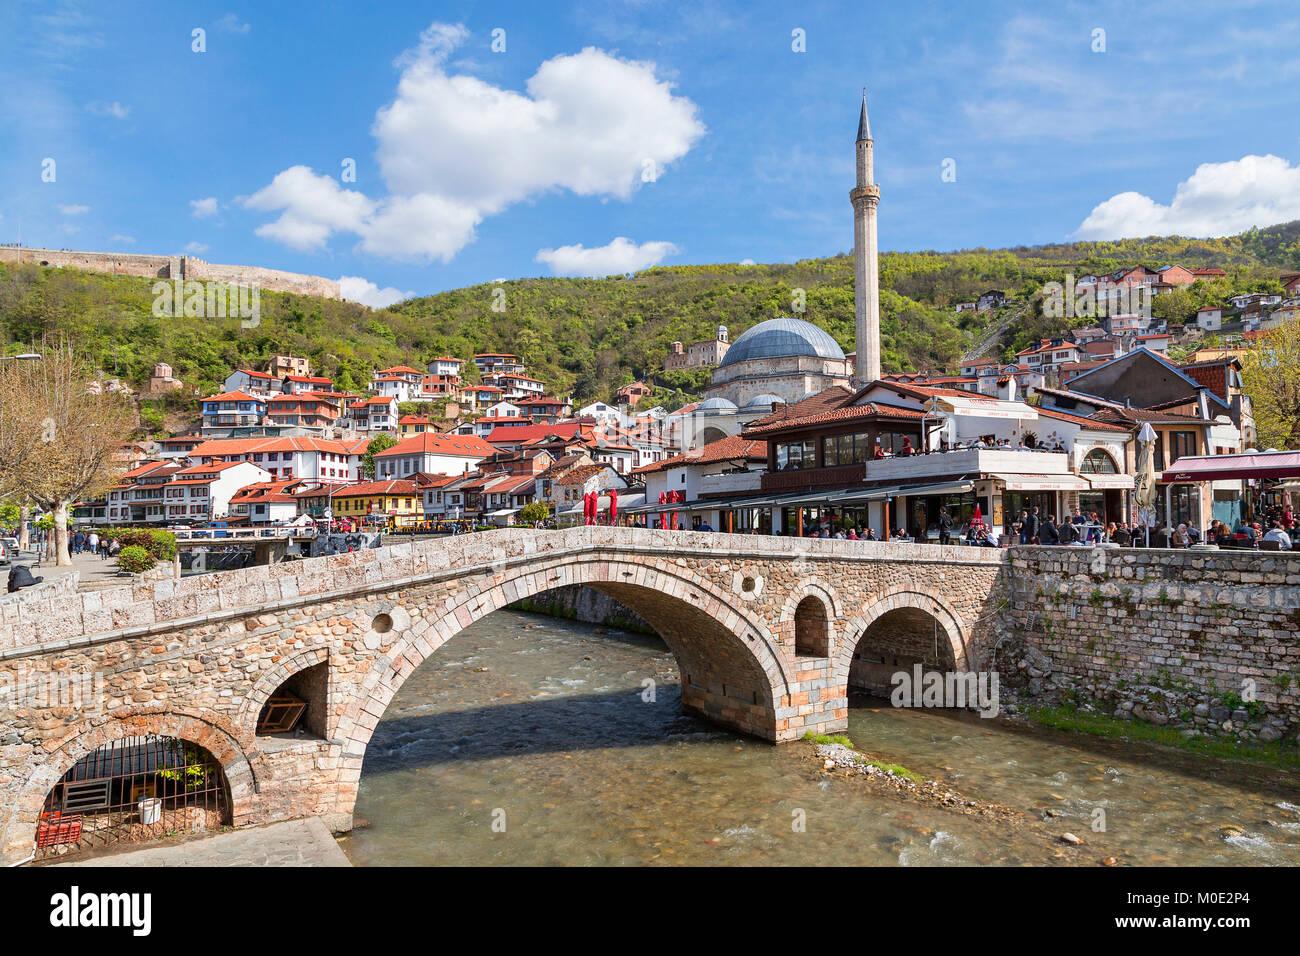 Old stone bridge and mosque in Prizren, Kosovo. Stock Photo